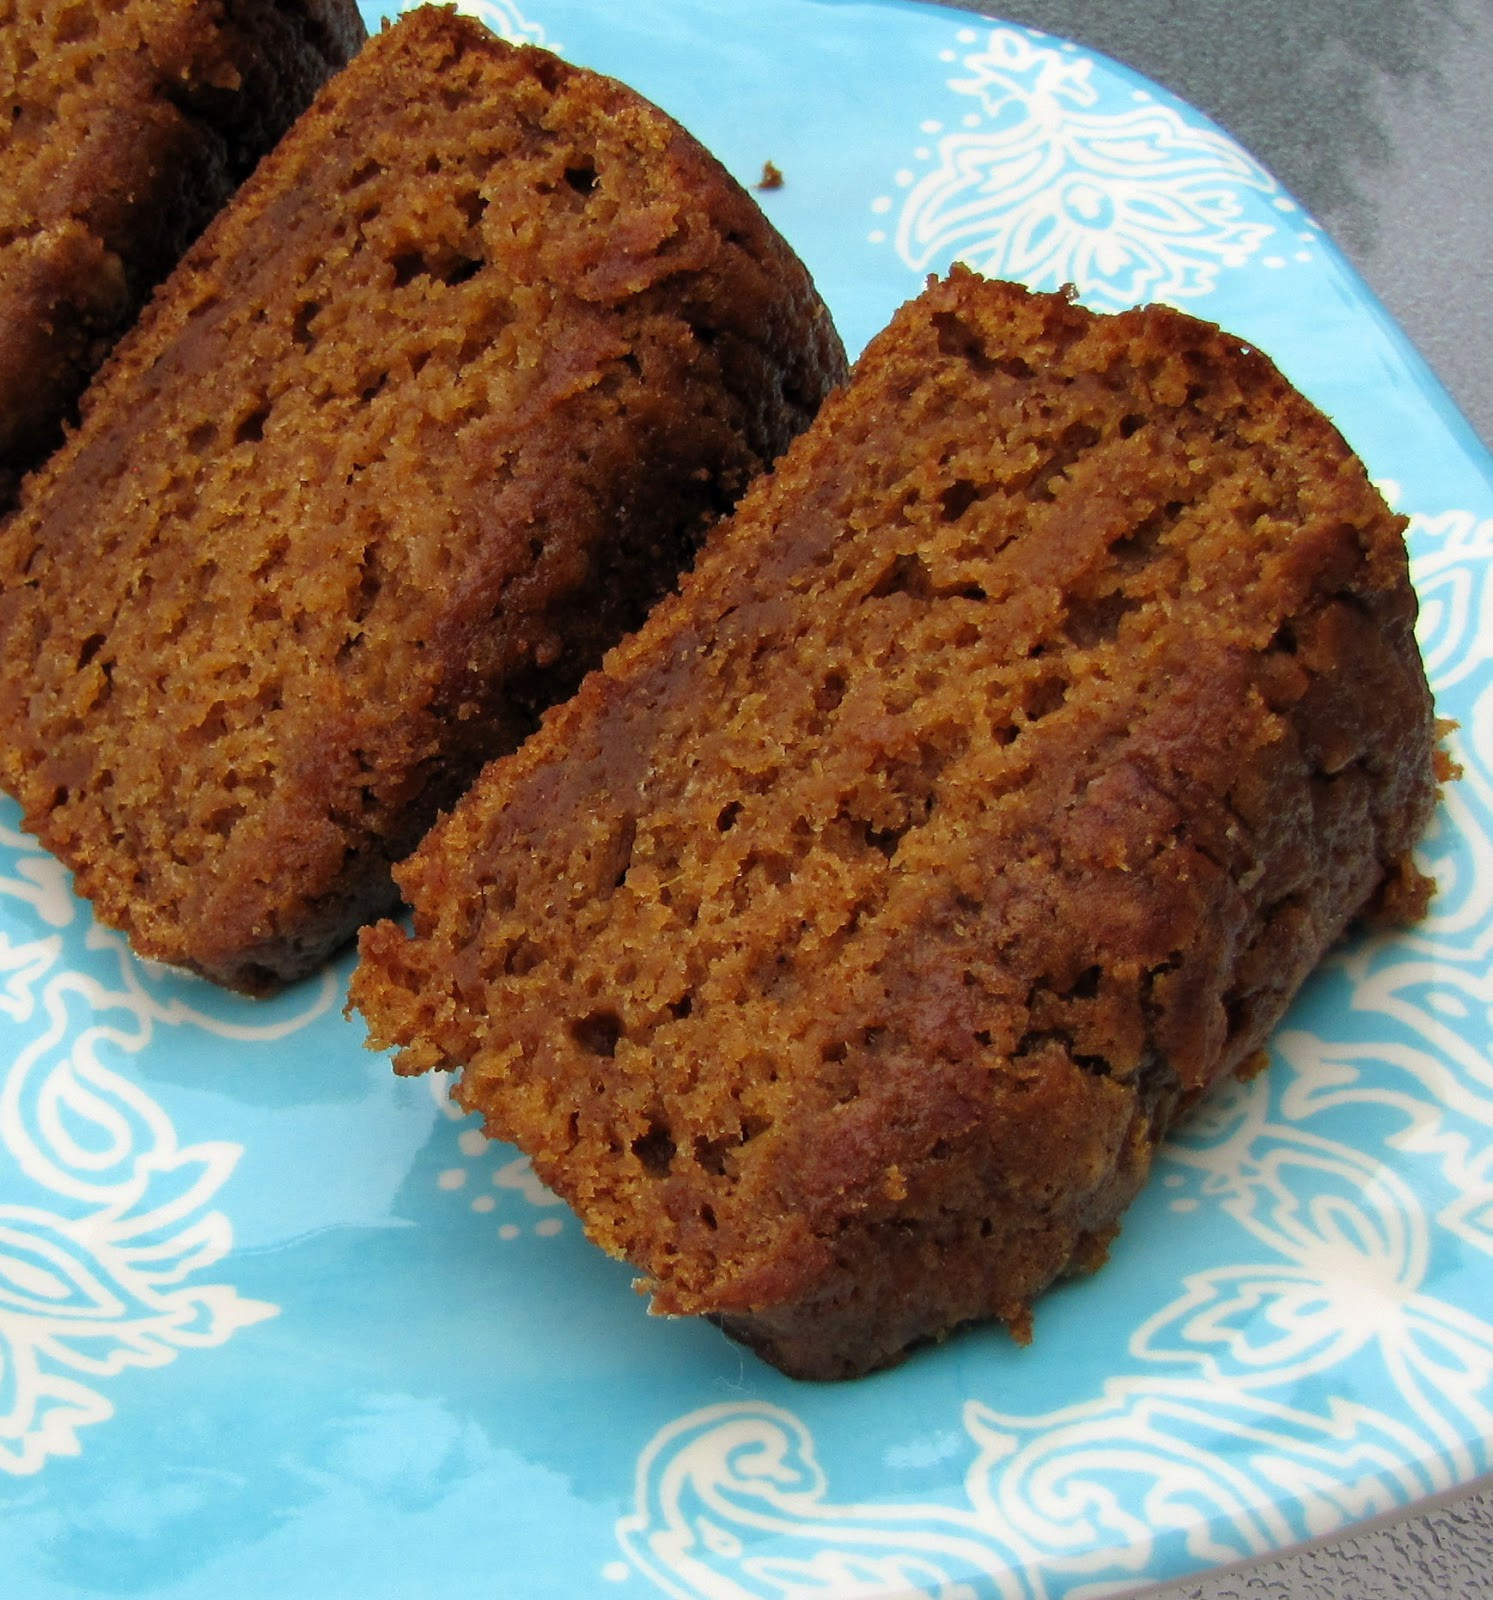 Pumpkin Bread Recipe Healthy  Rumbly in my Tumbly Healthy Pumpkin Bread no oil